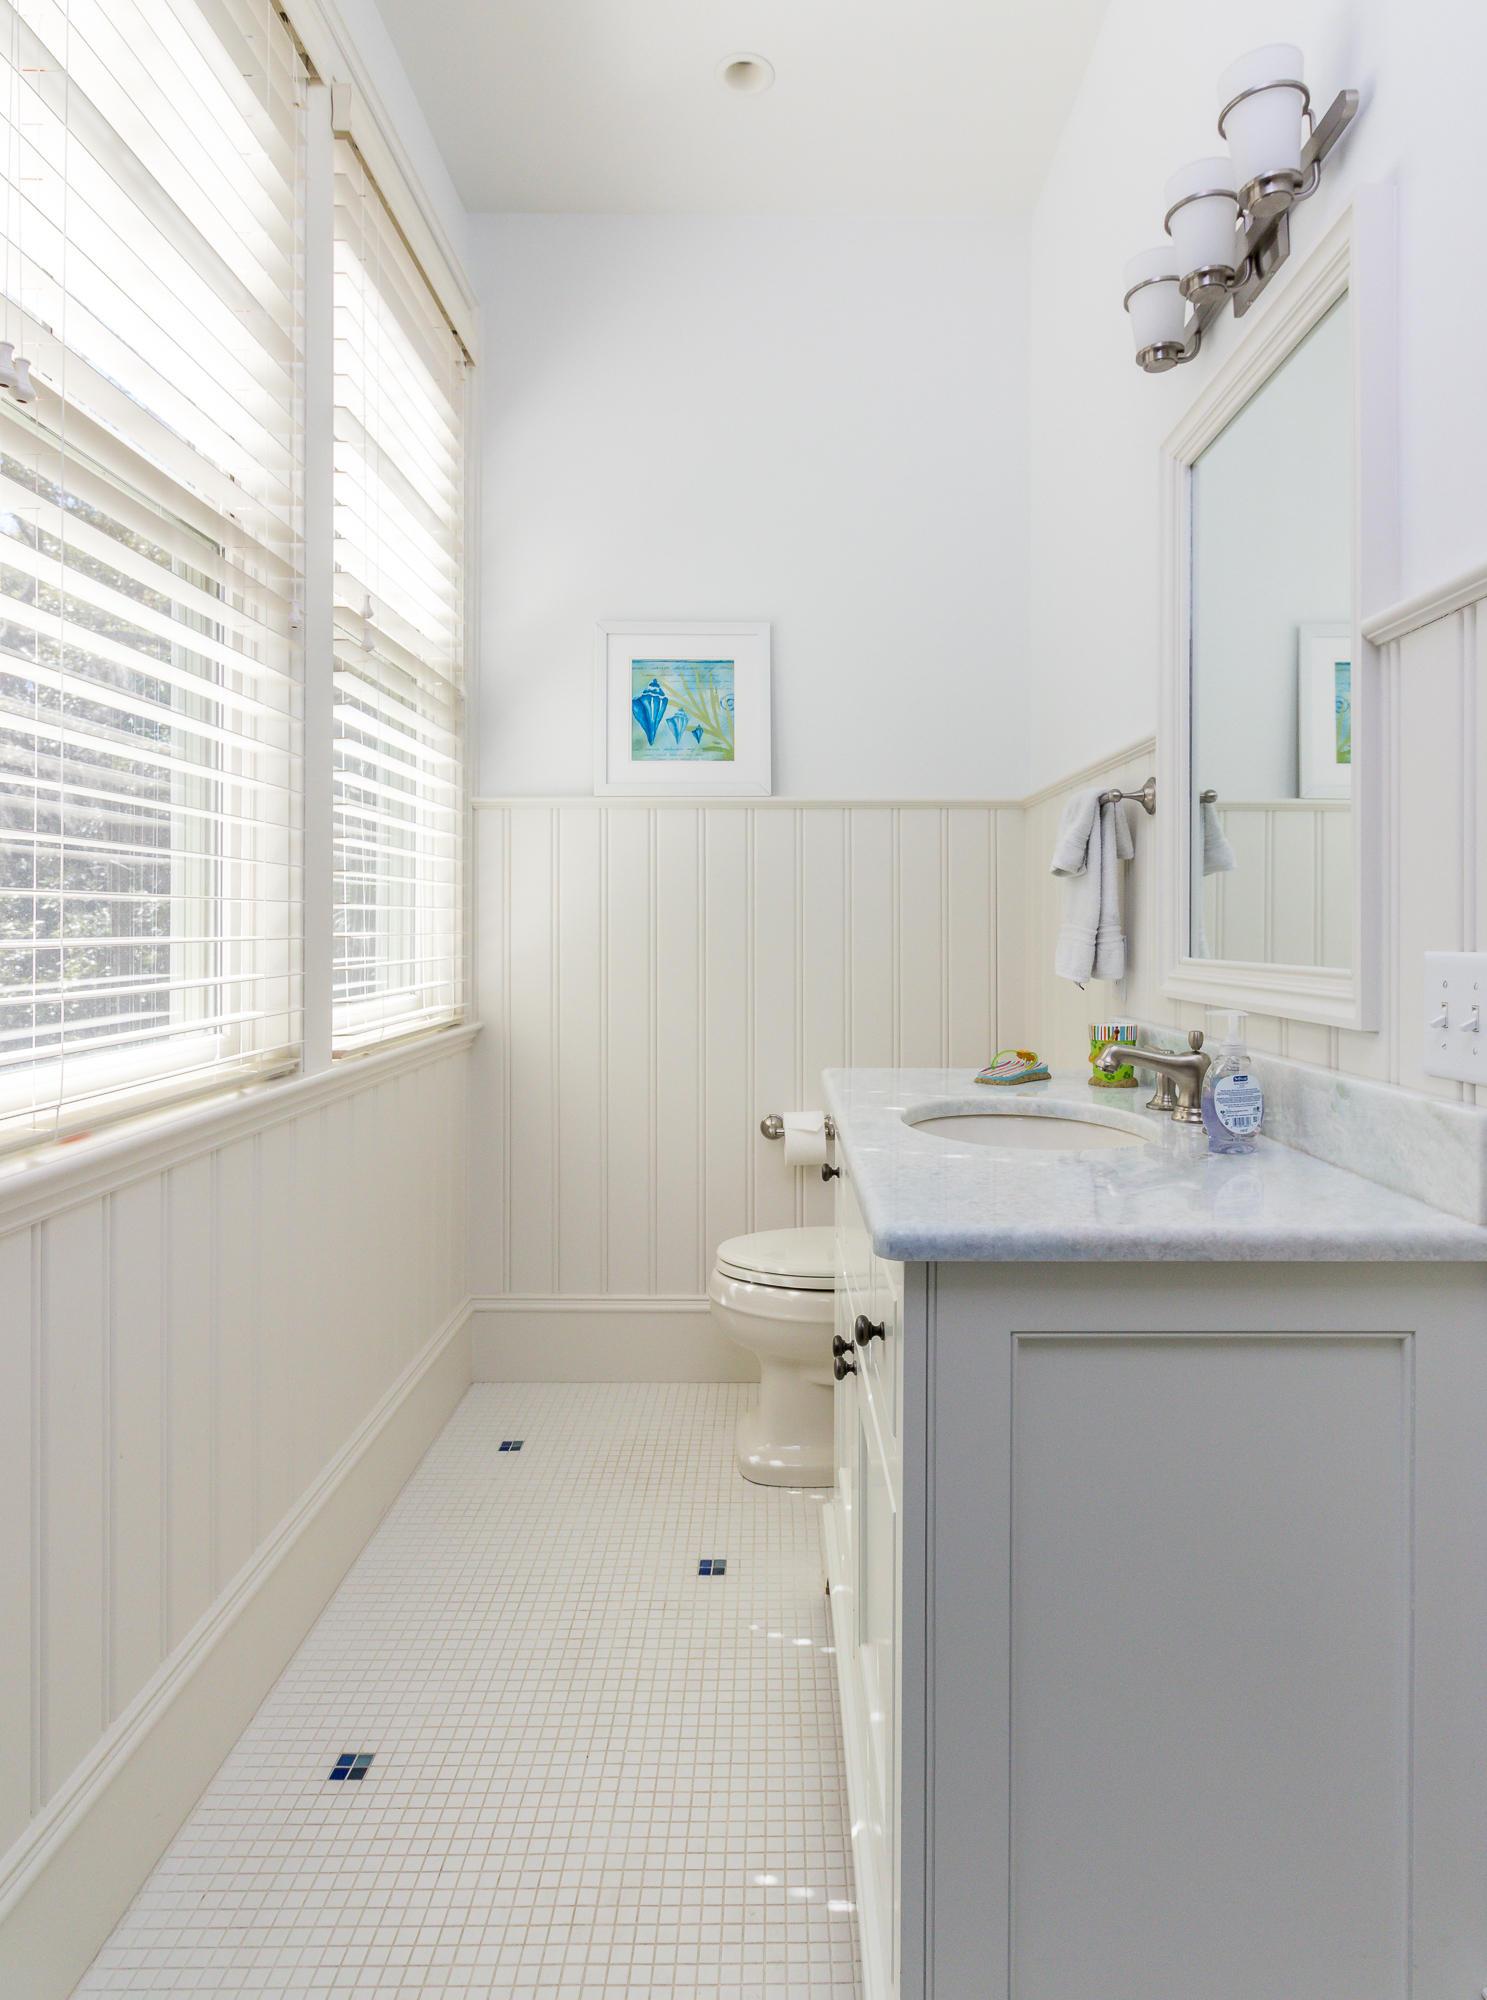 Egret/Pintail Homes For Sale - 117 Bufflehead, Kiawah Island, SC - 28